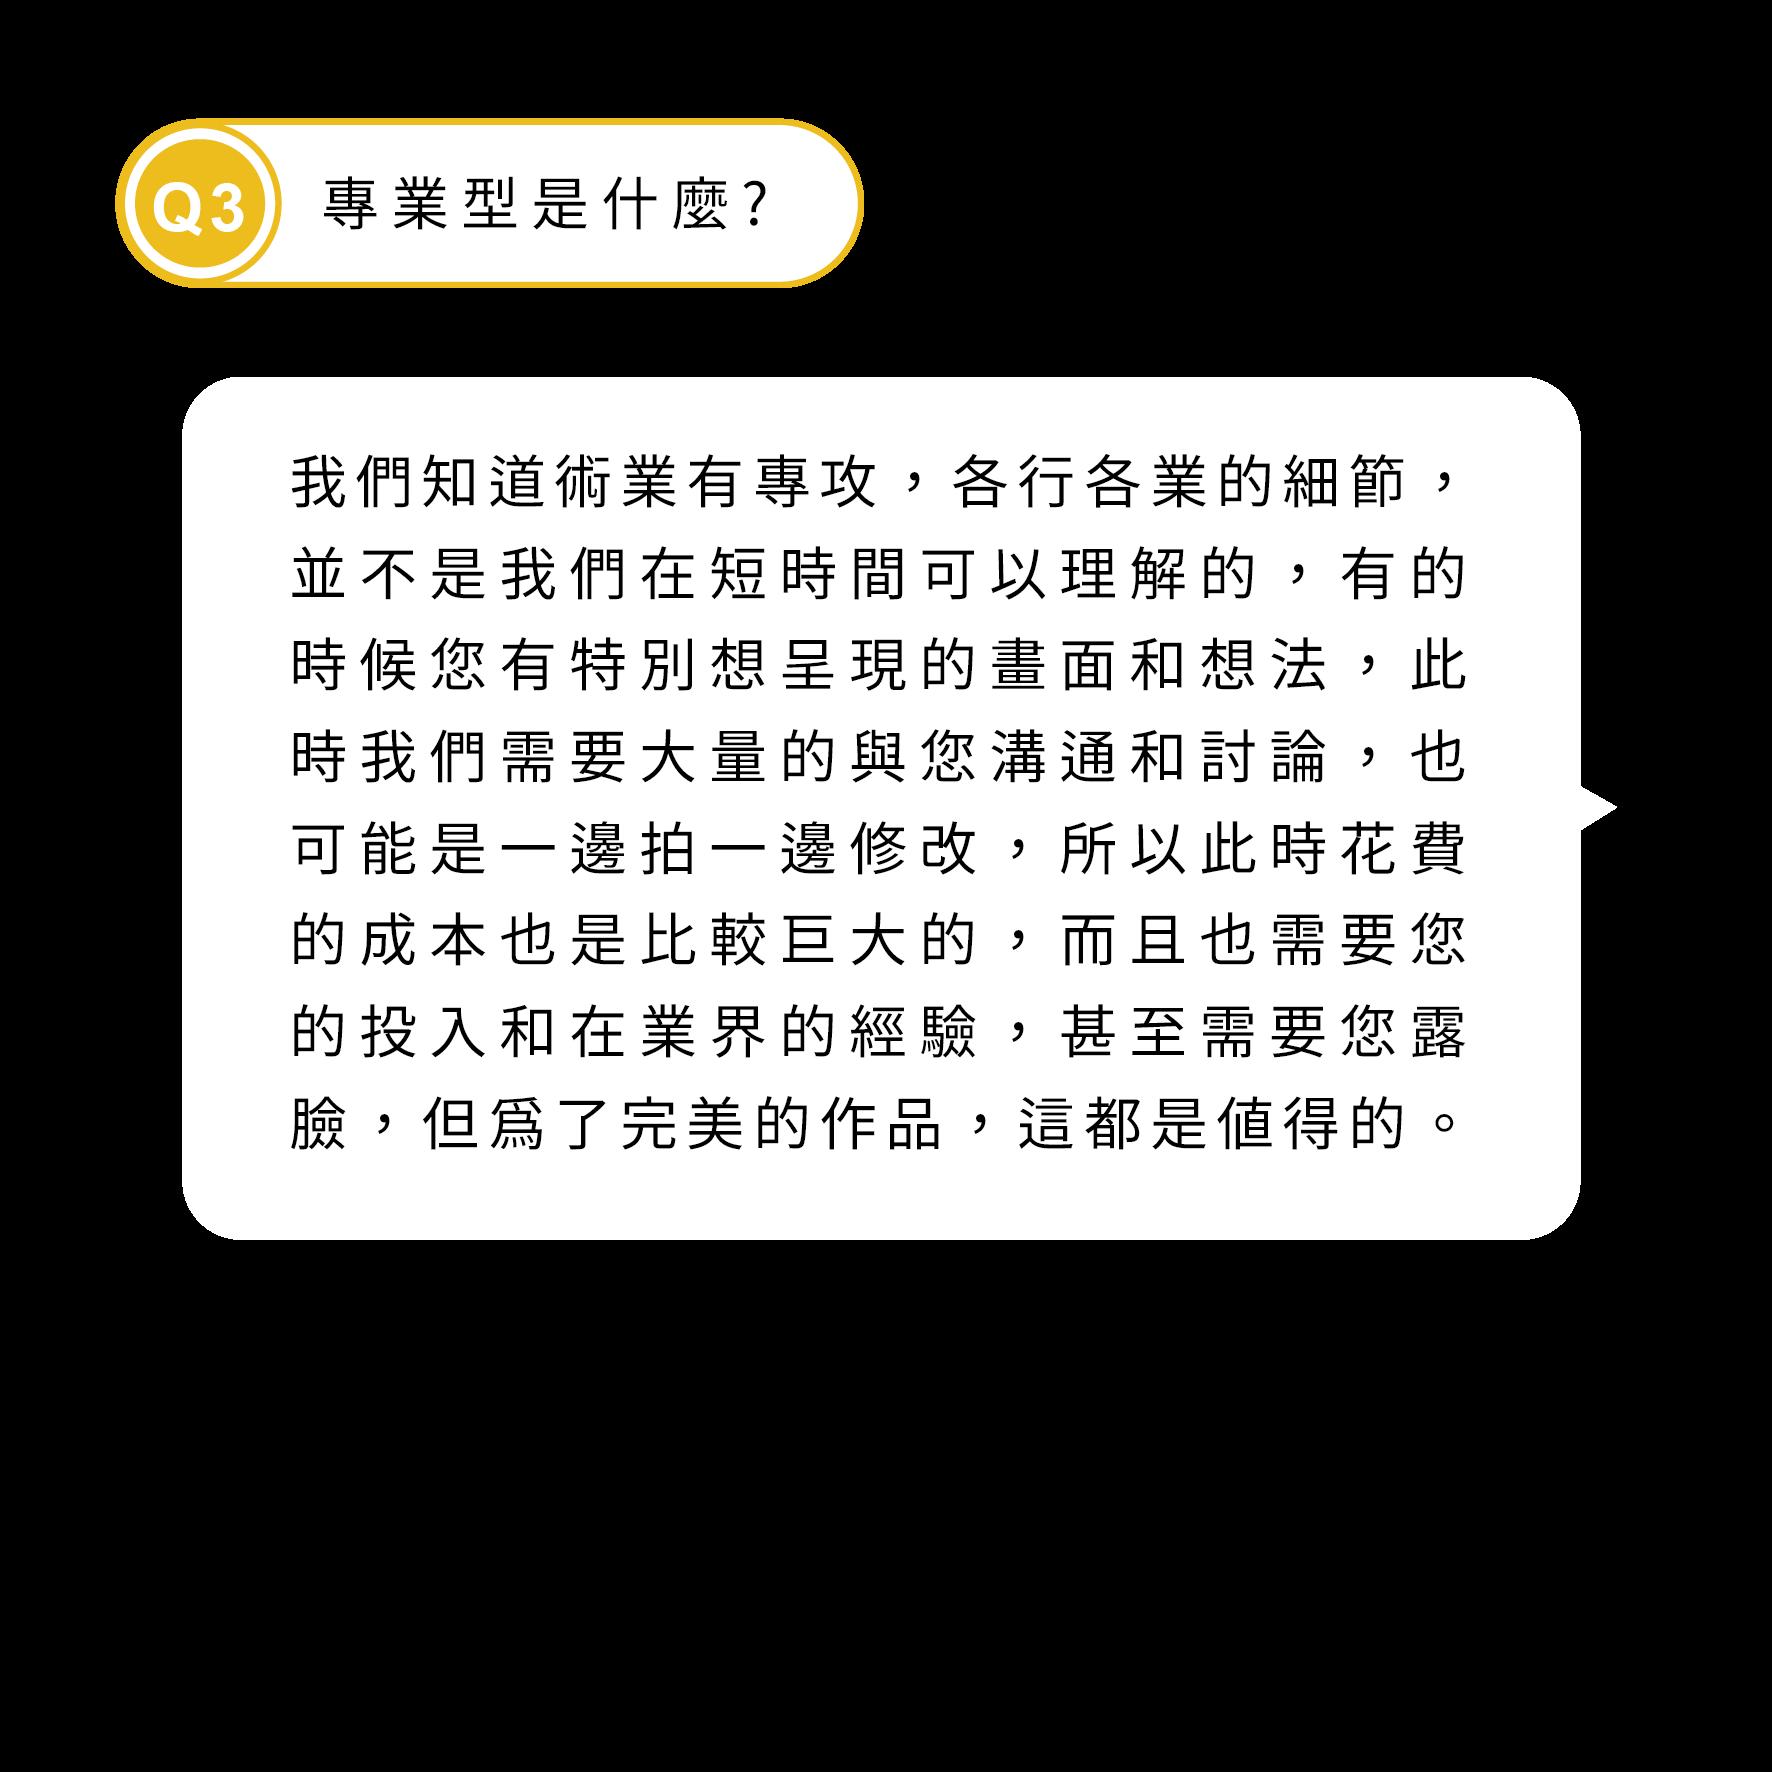 Q3 (1)